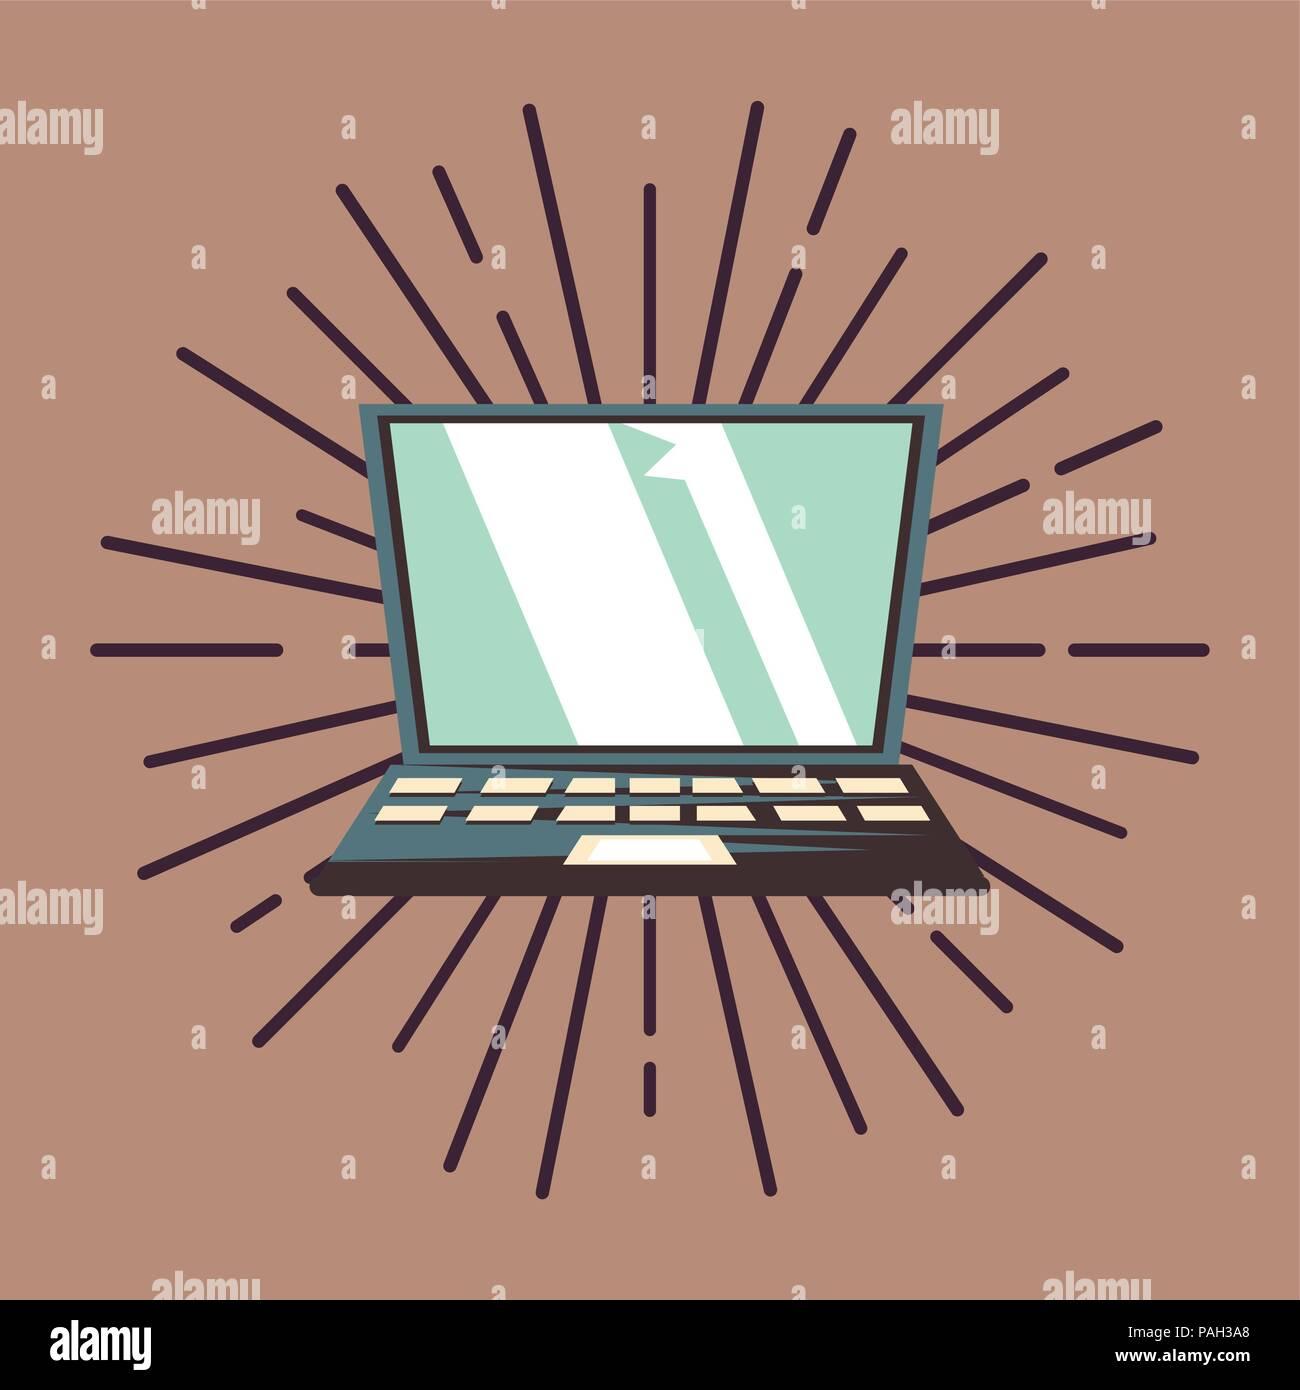 laptop keyboard on vintage retro background vector illustration - Stock Image